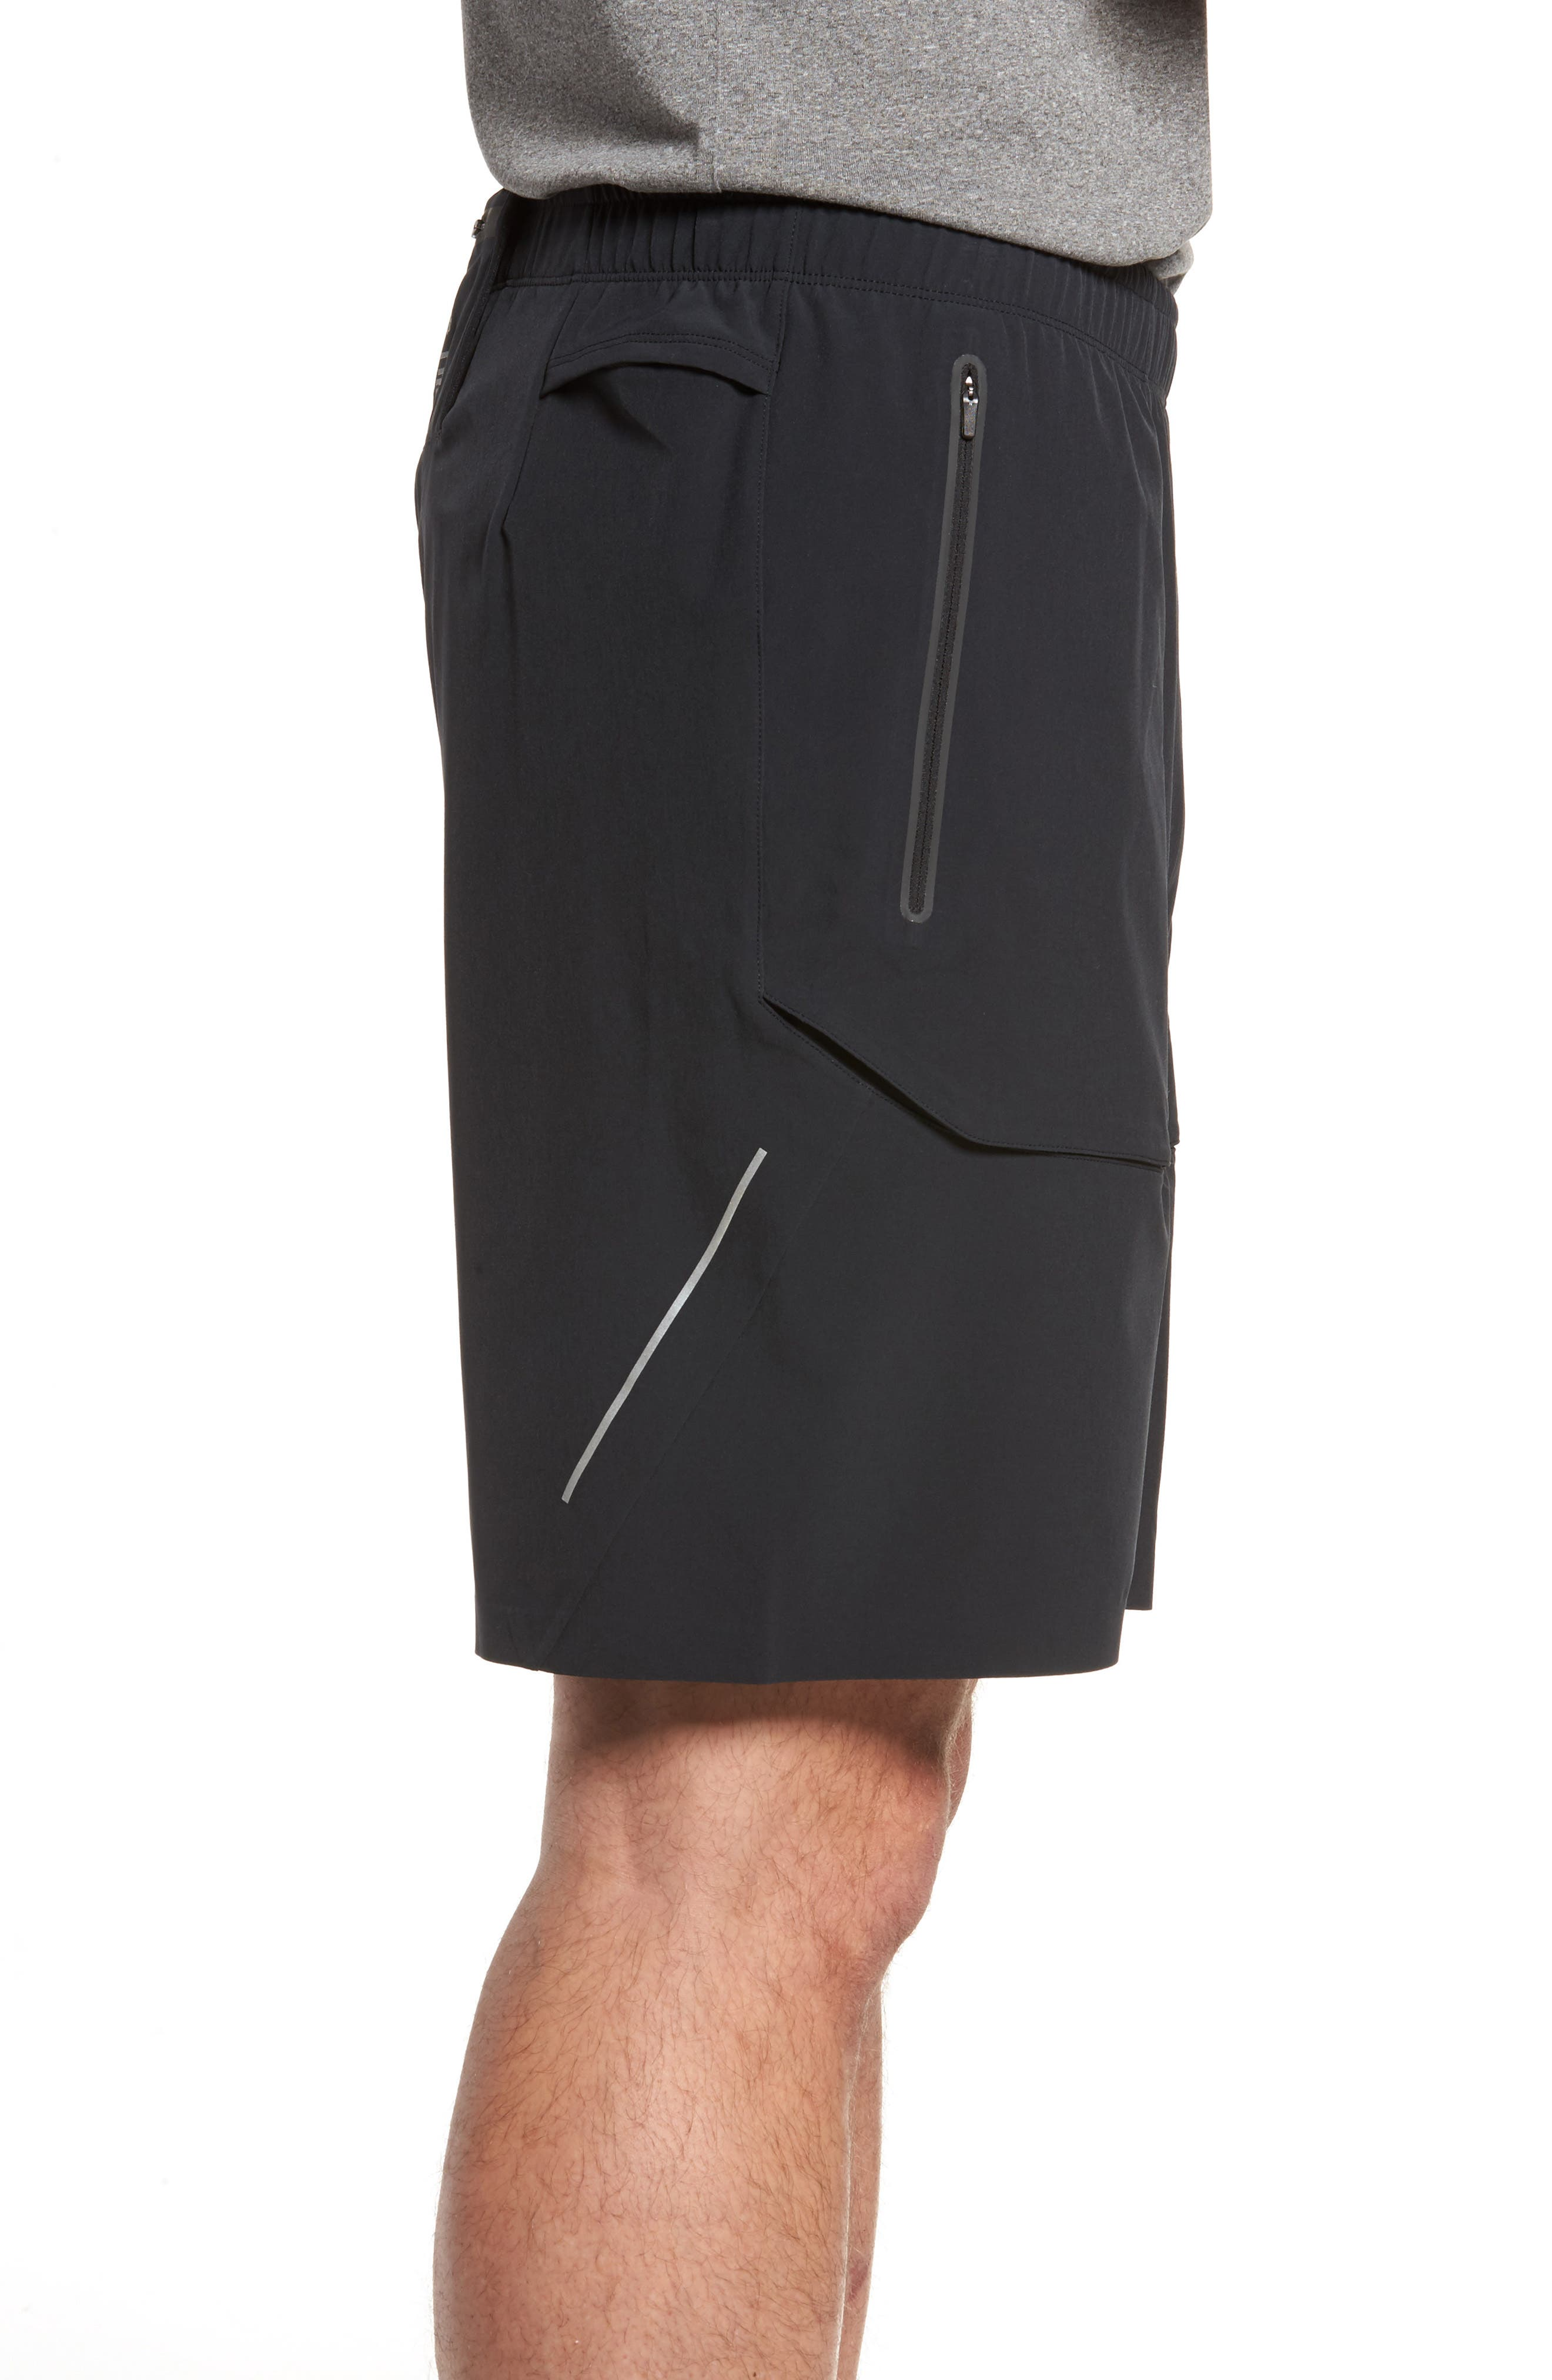 Running Shield Shorts,                             Alternate thumbnail 3, color,                             010